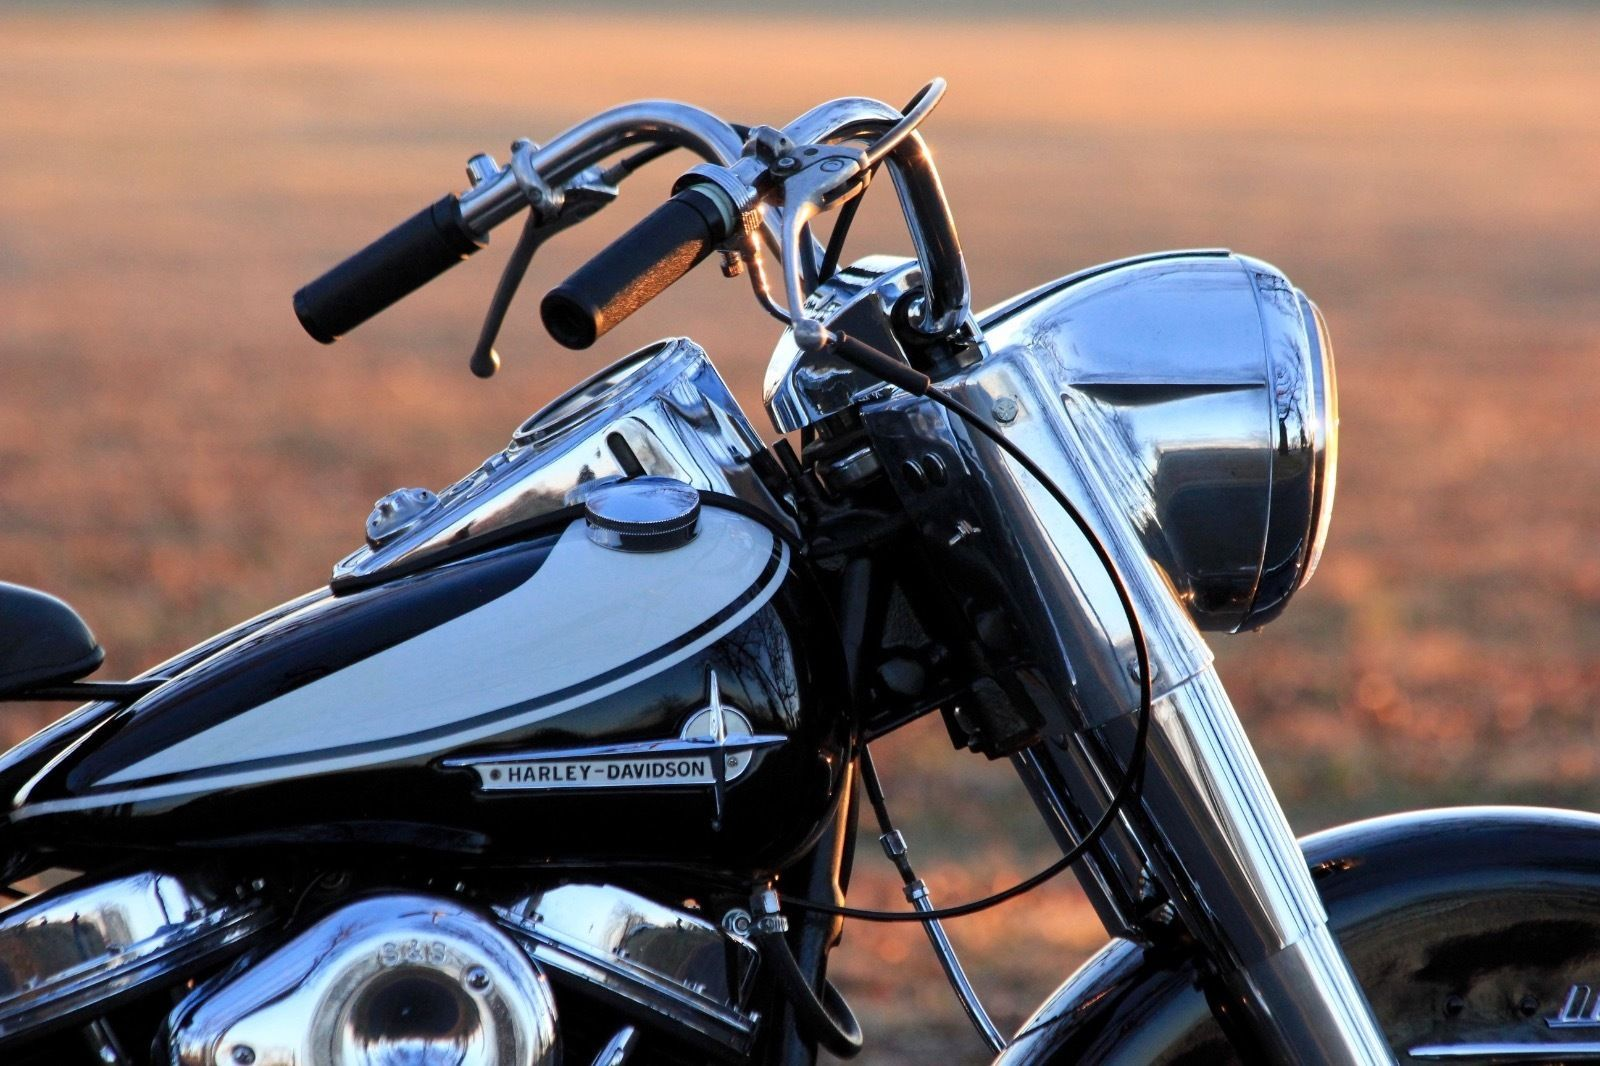 Ebay Motors Motorcycles >> 1962 Harley Davidson Flh Panhead Motorcycles Harley Davidson